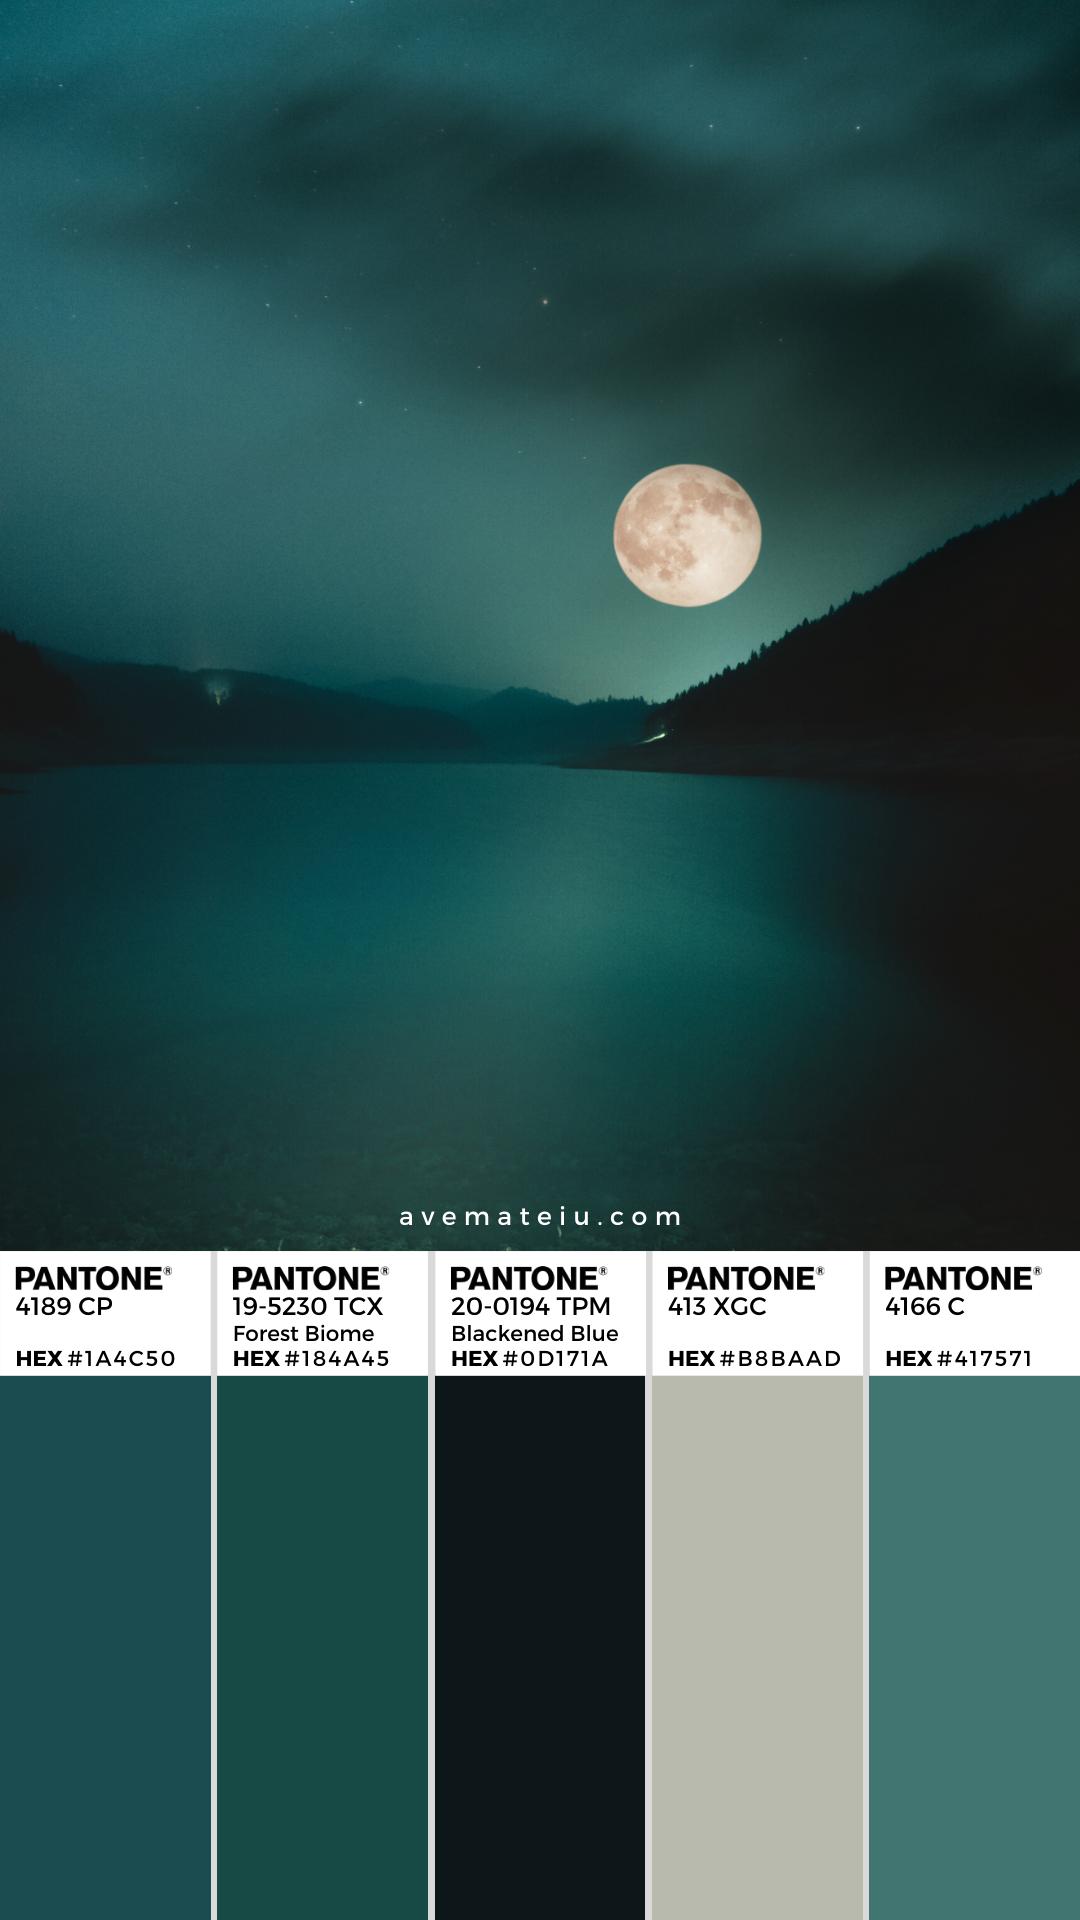 Full Moon over the mountain lake Pantone Color Palette 356 - #Color #colour #Full #lake #Moon #mountain #Palette #Pantone